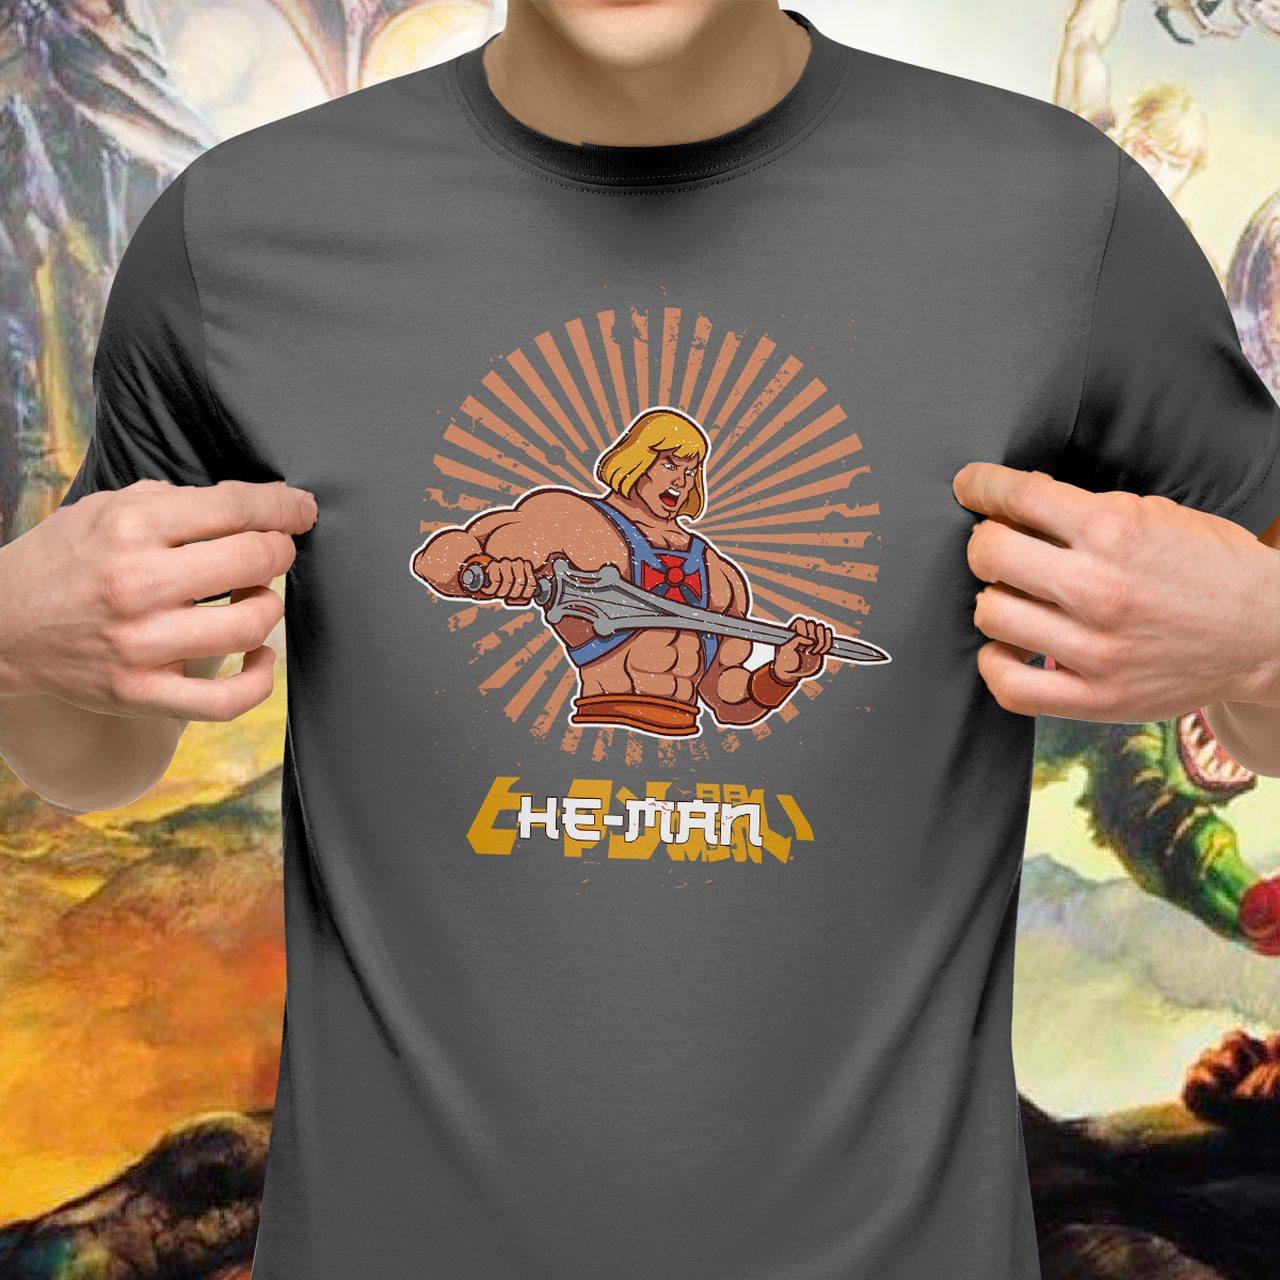 Camiseta Unissex He-Man: Mestres do Universo (Masters of the Universe)